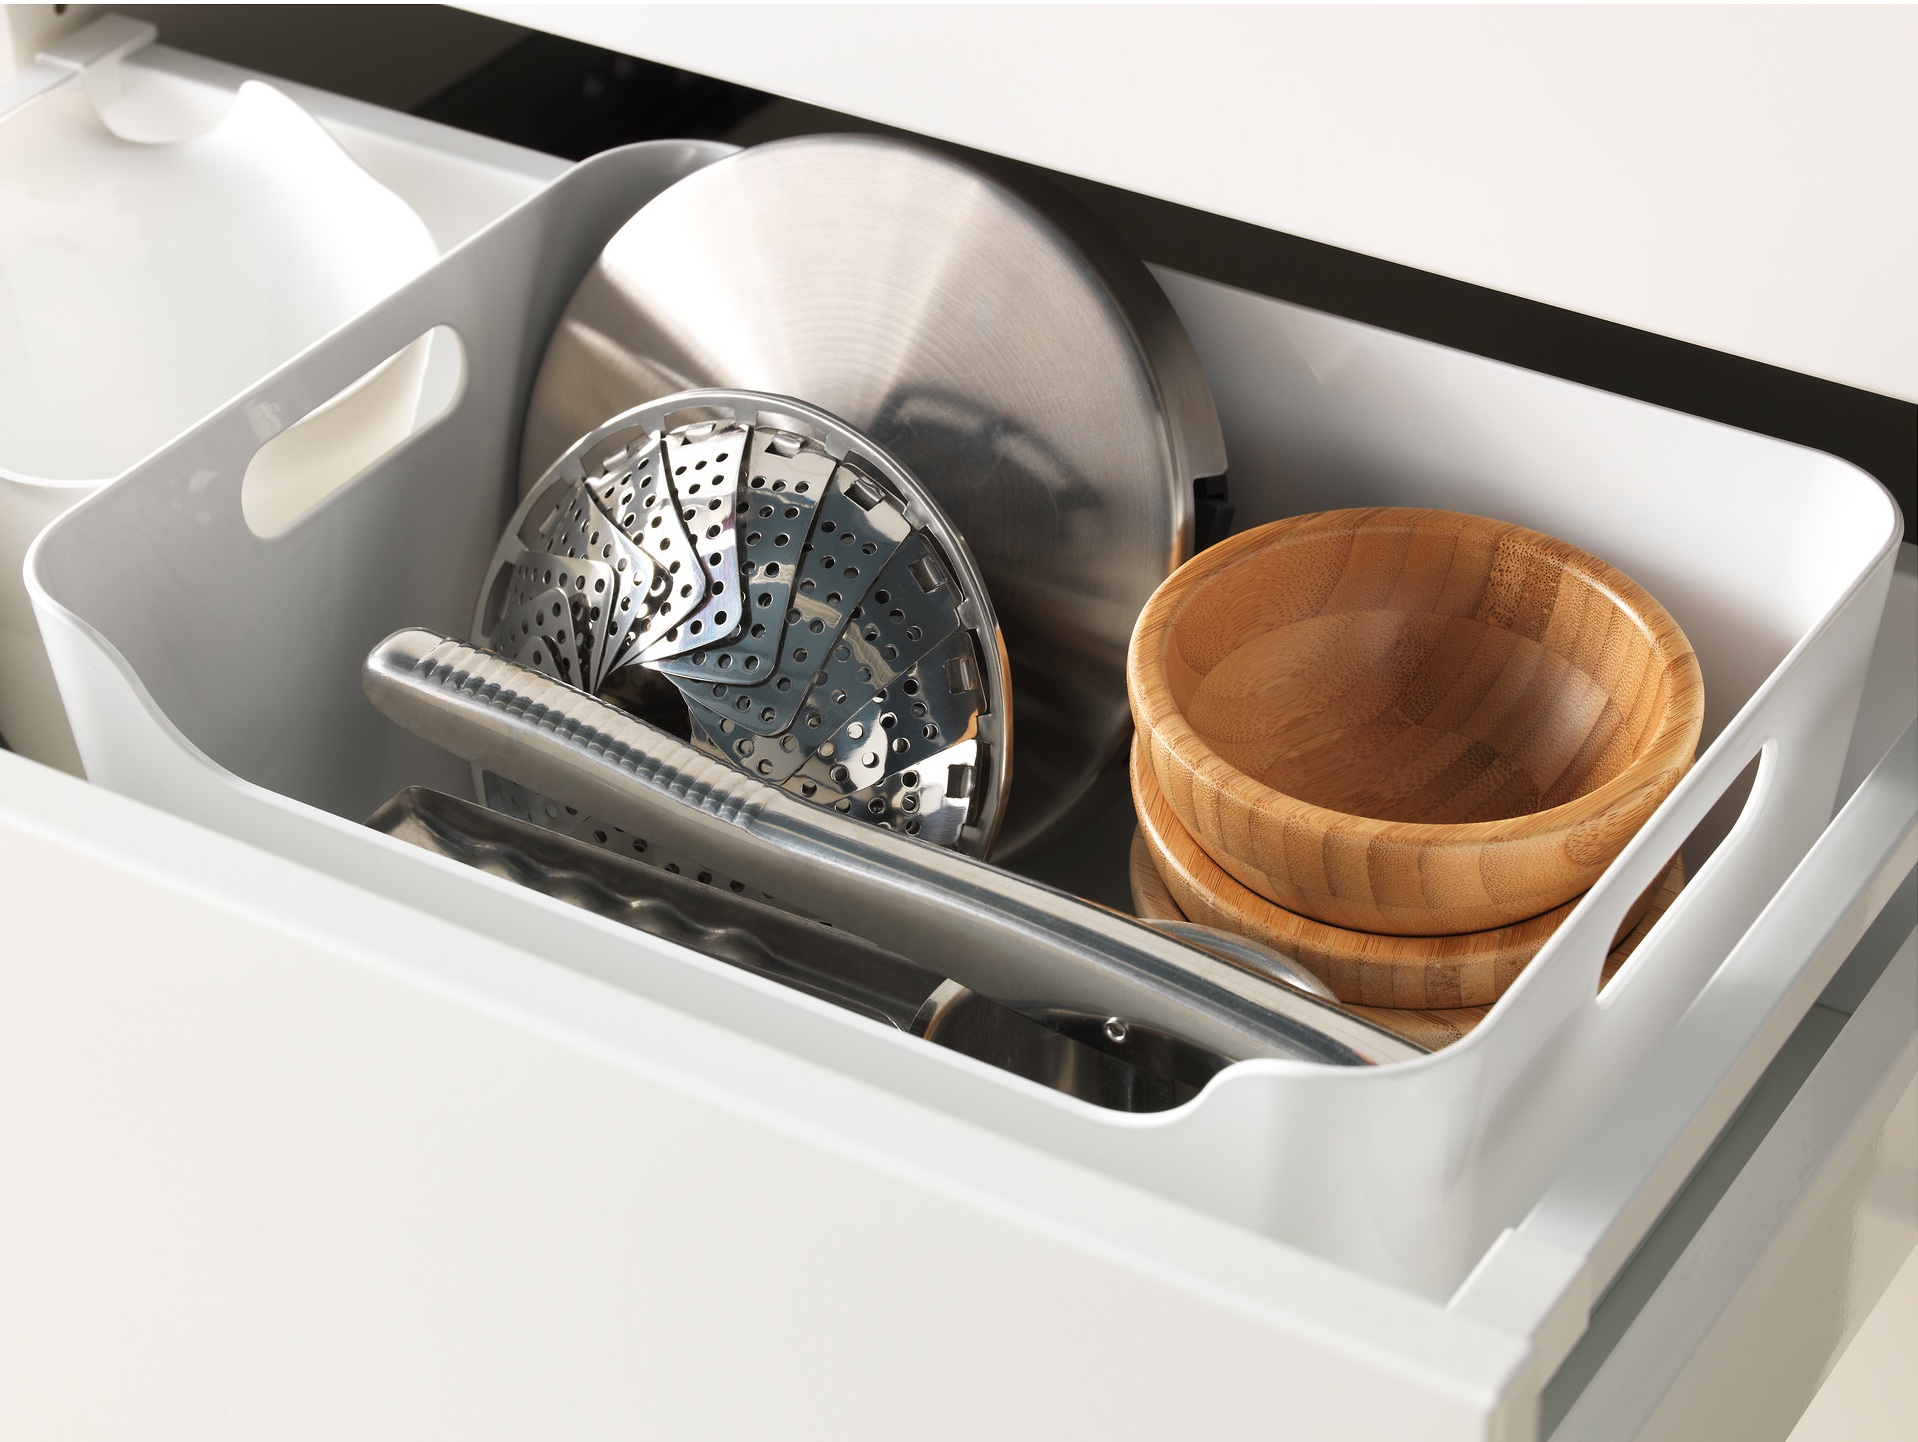 Binario Pensili Cucina Ikea 3 idee per ricavare spazio in cucina - mansarda.it